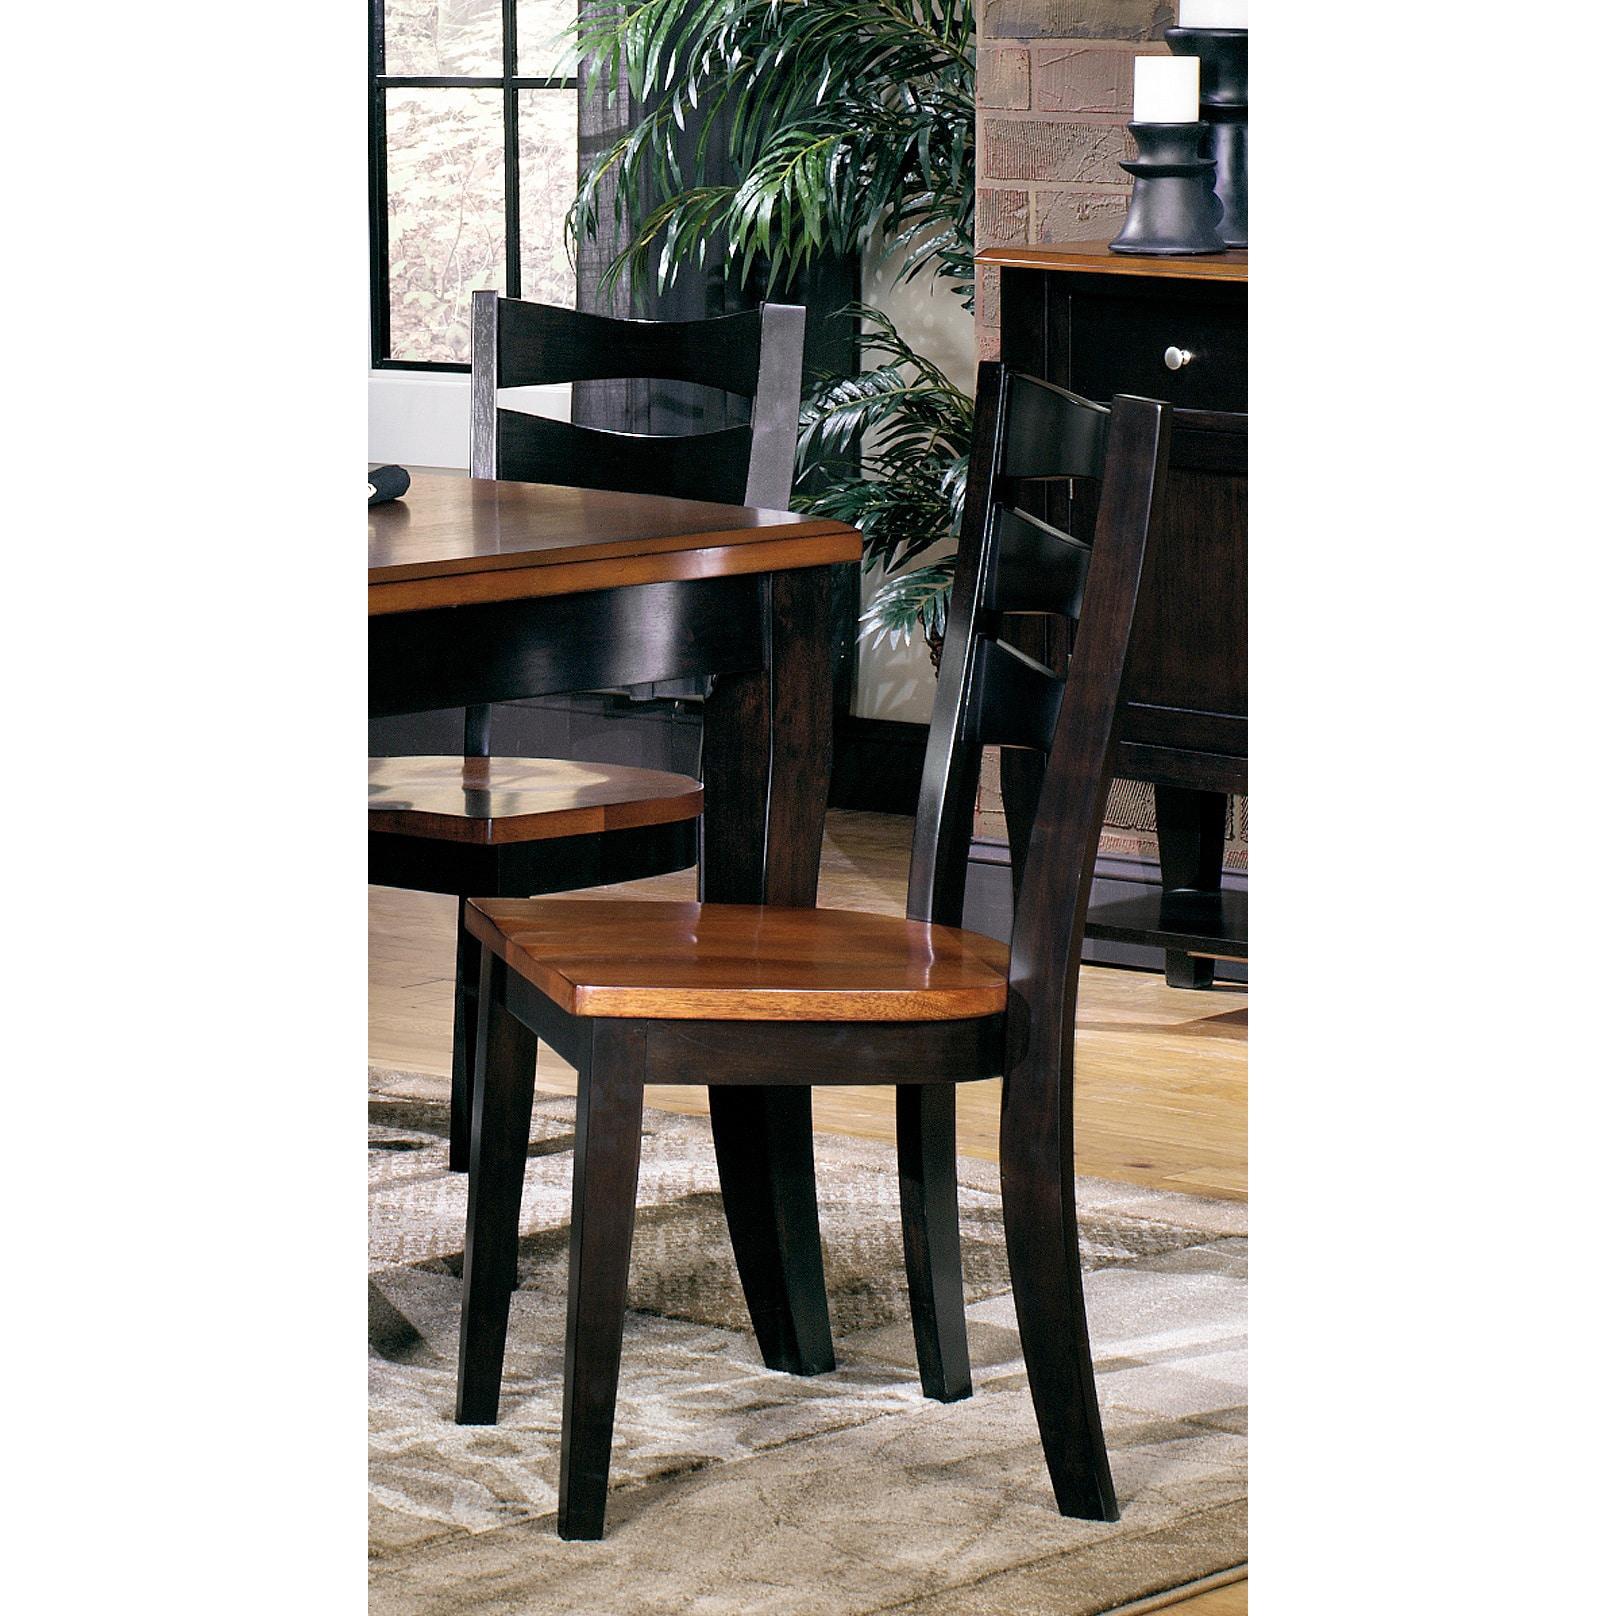 Strange Jake Black Oak Dining Chairs Set Of 2 Download Free Architecture Designs Scobabritishbridgeorg